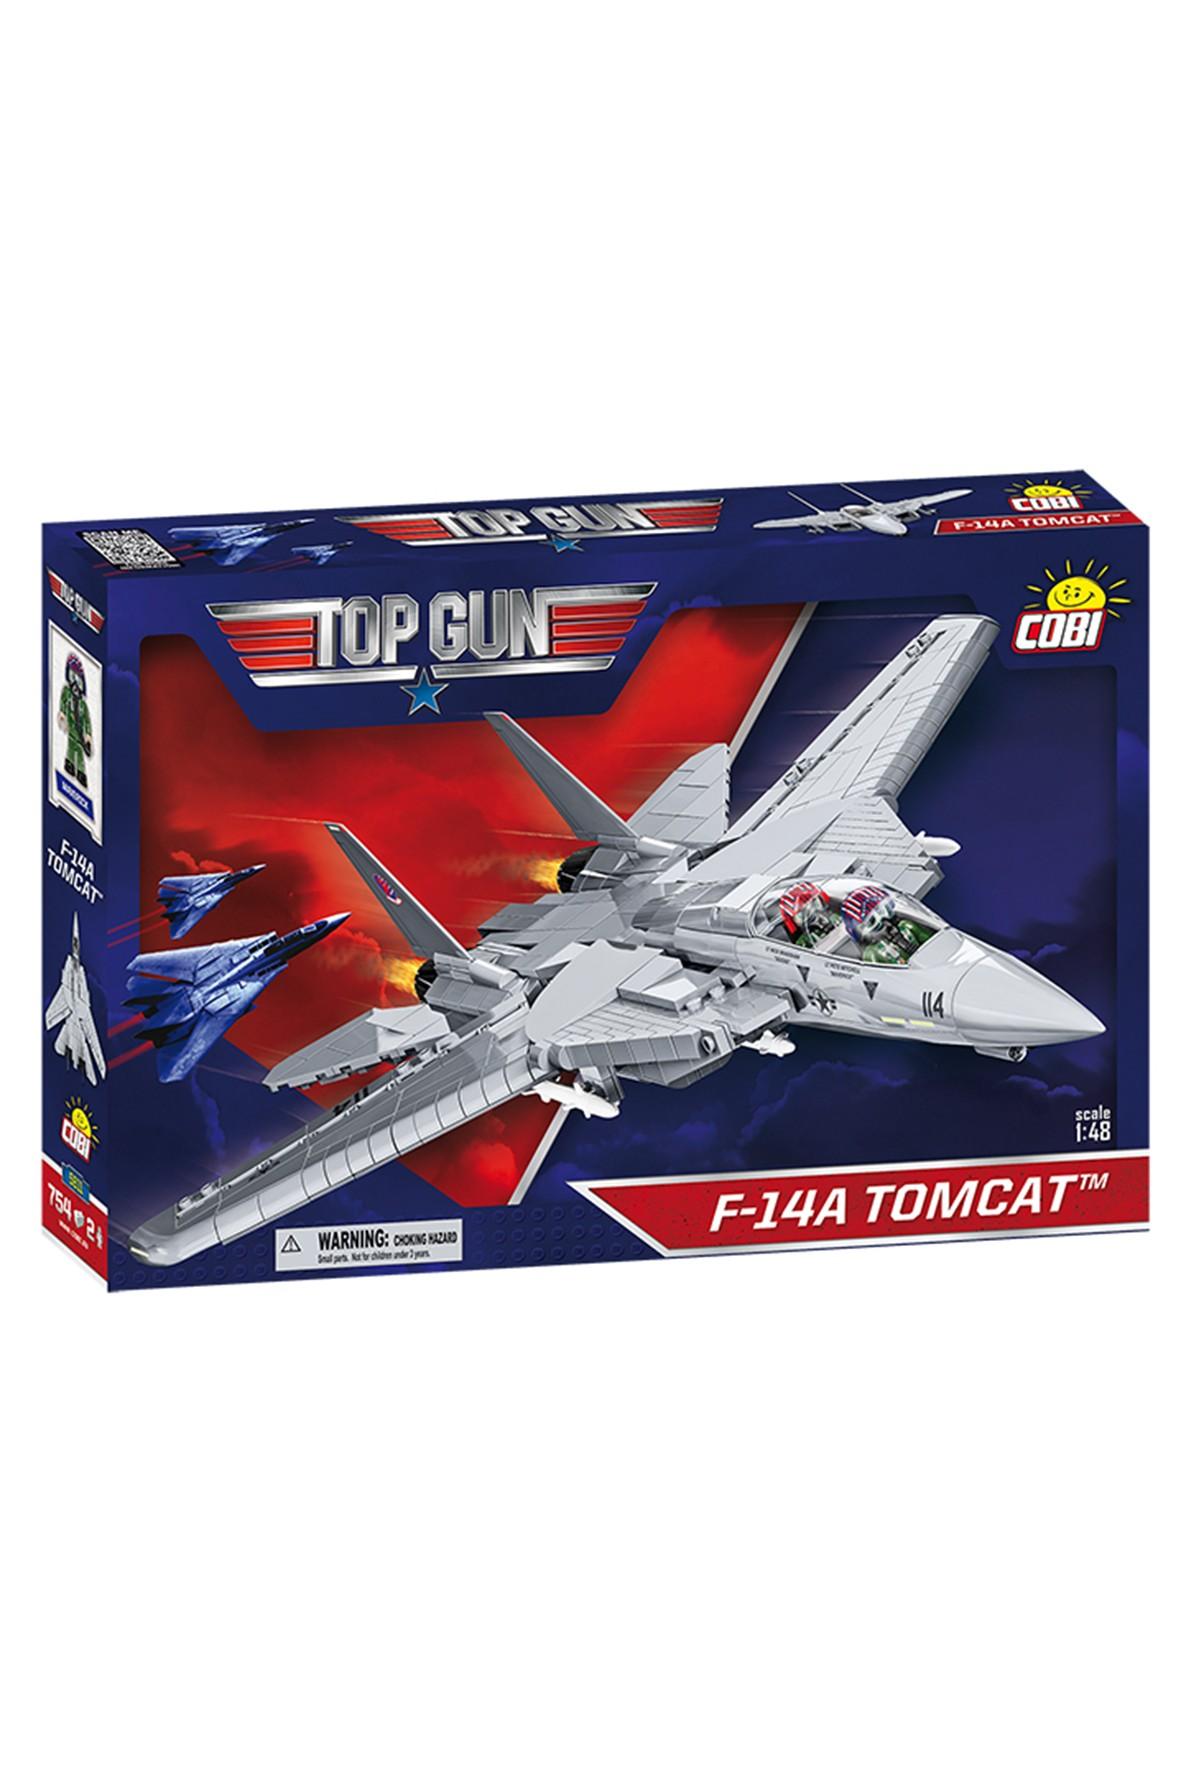 Klocki COBI 5811 TOP-GUN F-14A Tomcat - 754 elementy wiek 7+